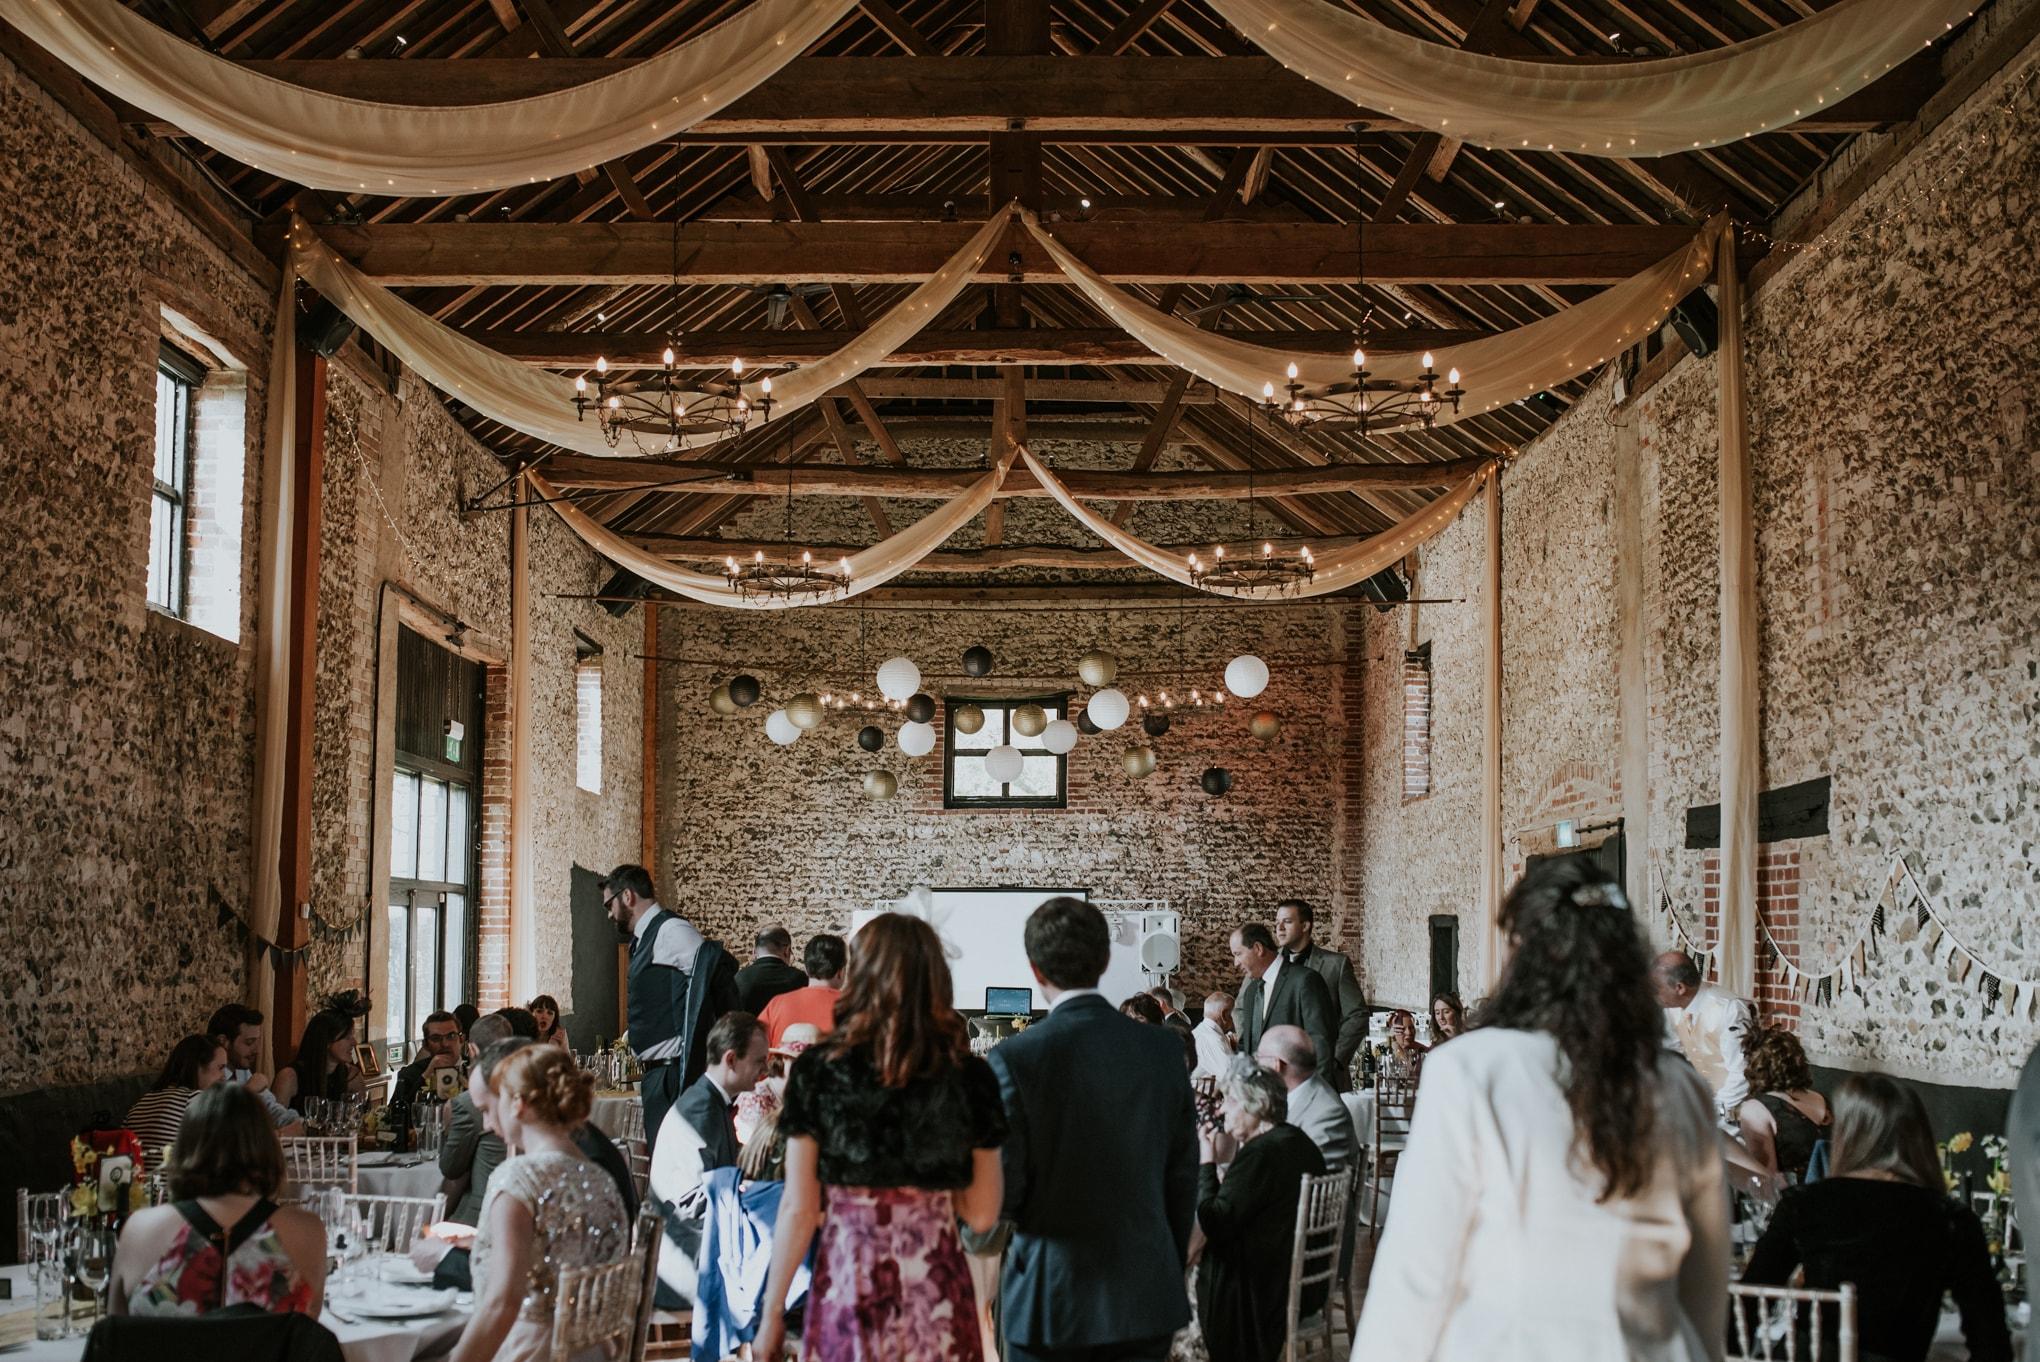 WeddingMatt&KarenLoResInternet448-min.jpg